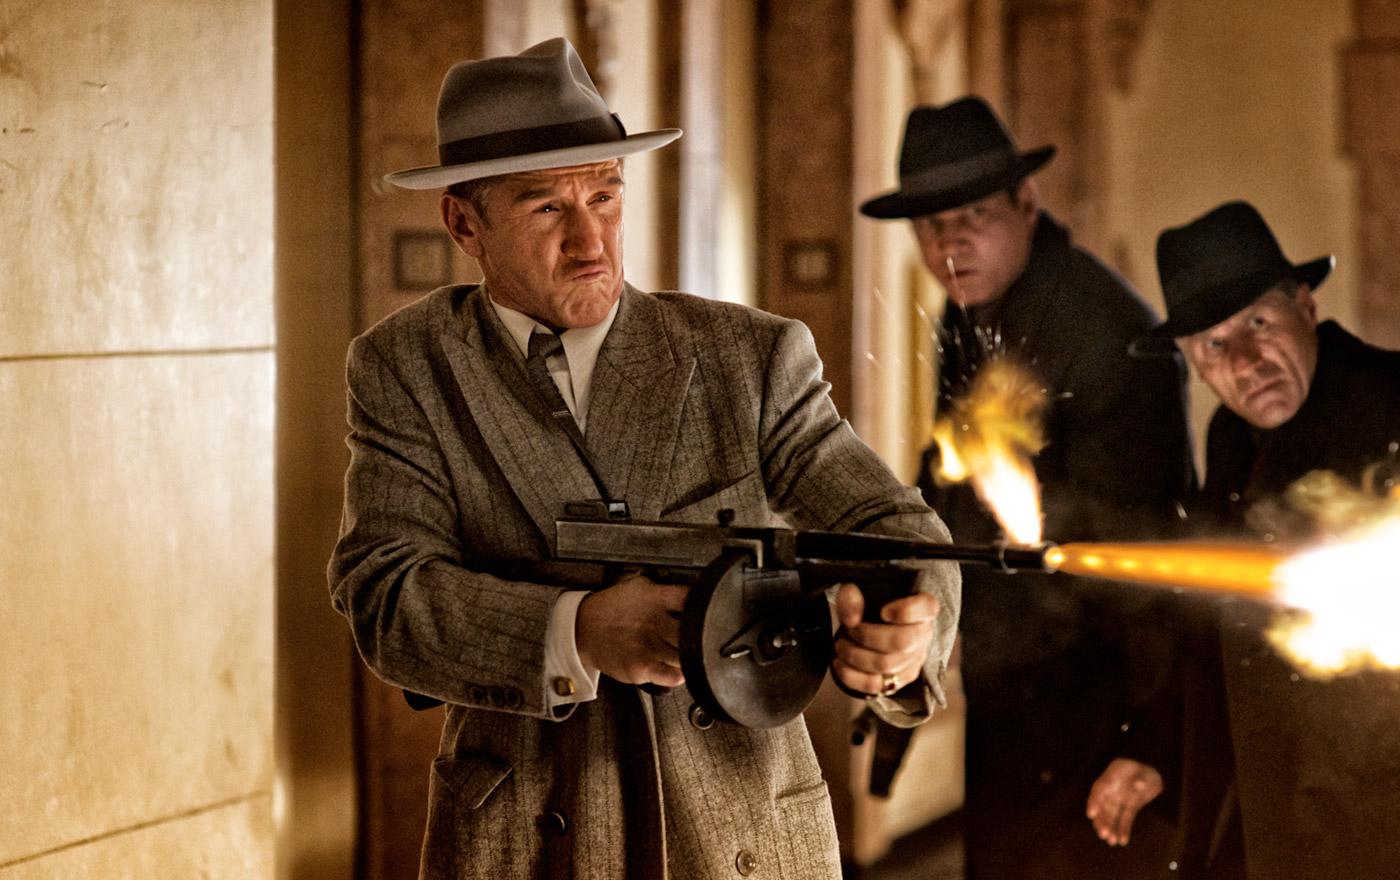 http://2.bp.blogspot.com/-ZJfu65fnyEM/UBEDB202DKI/AAAAAAAACtk/1p_SdBTFiXo/s1600/gangster-squad-movie-image-sean-penn.jpg